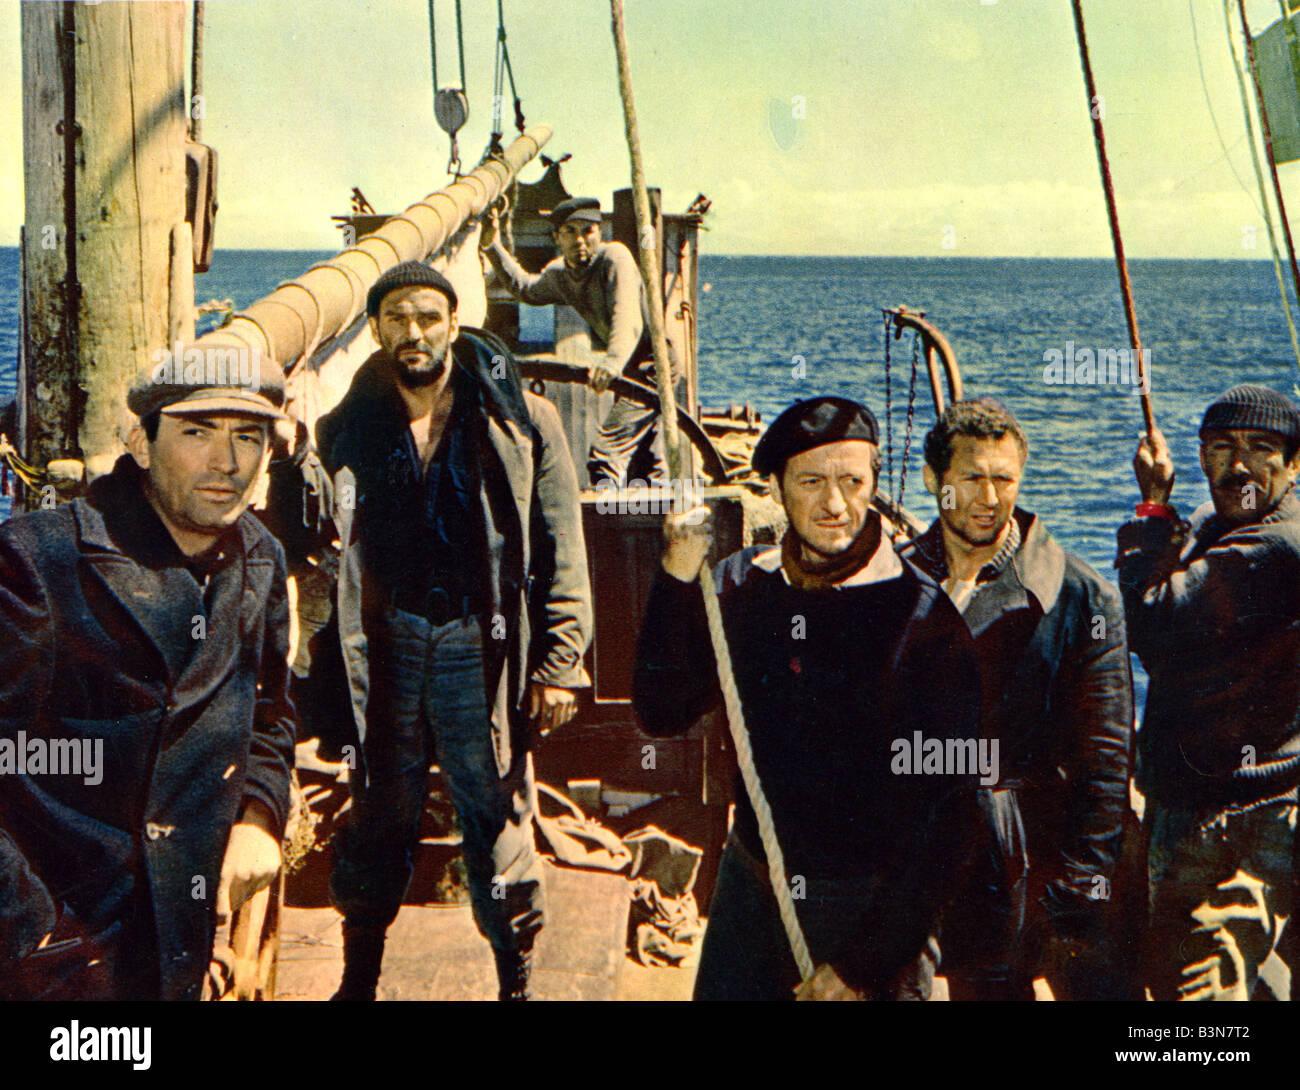 Guns Of Navarone 1961 Columbia Film See Description Below For Cast